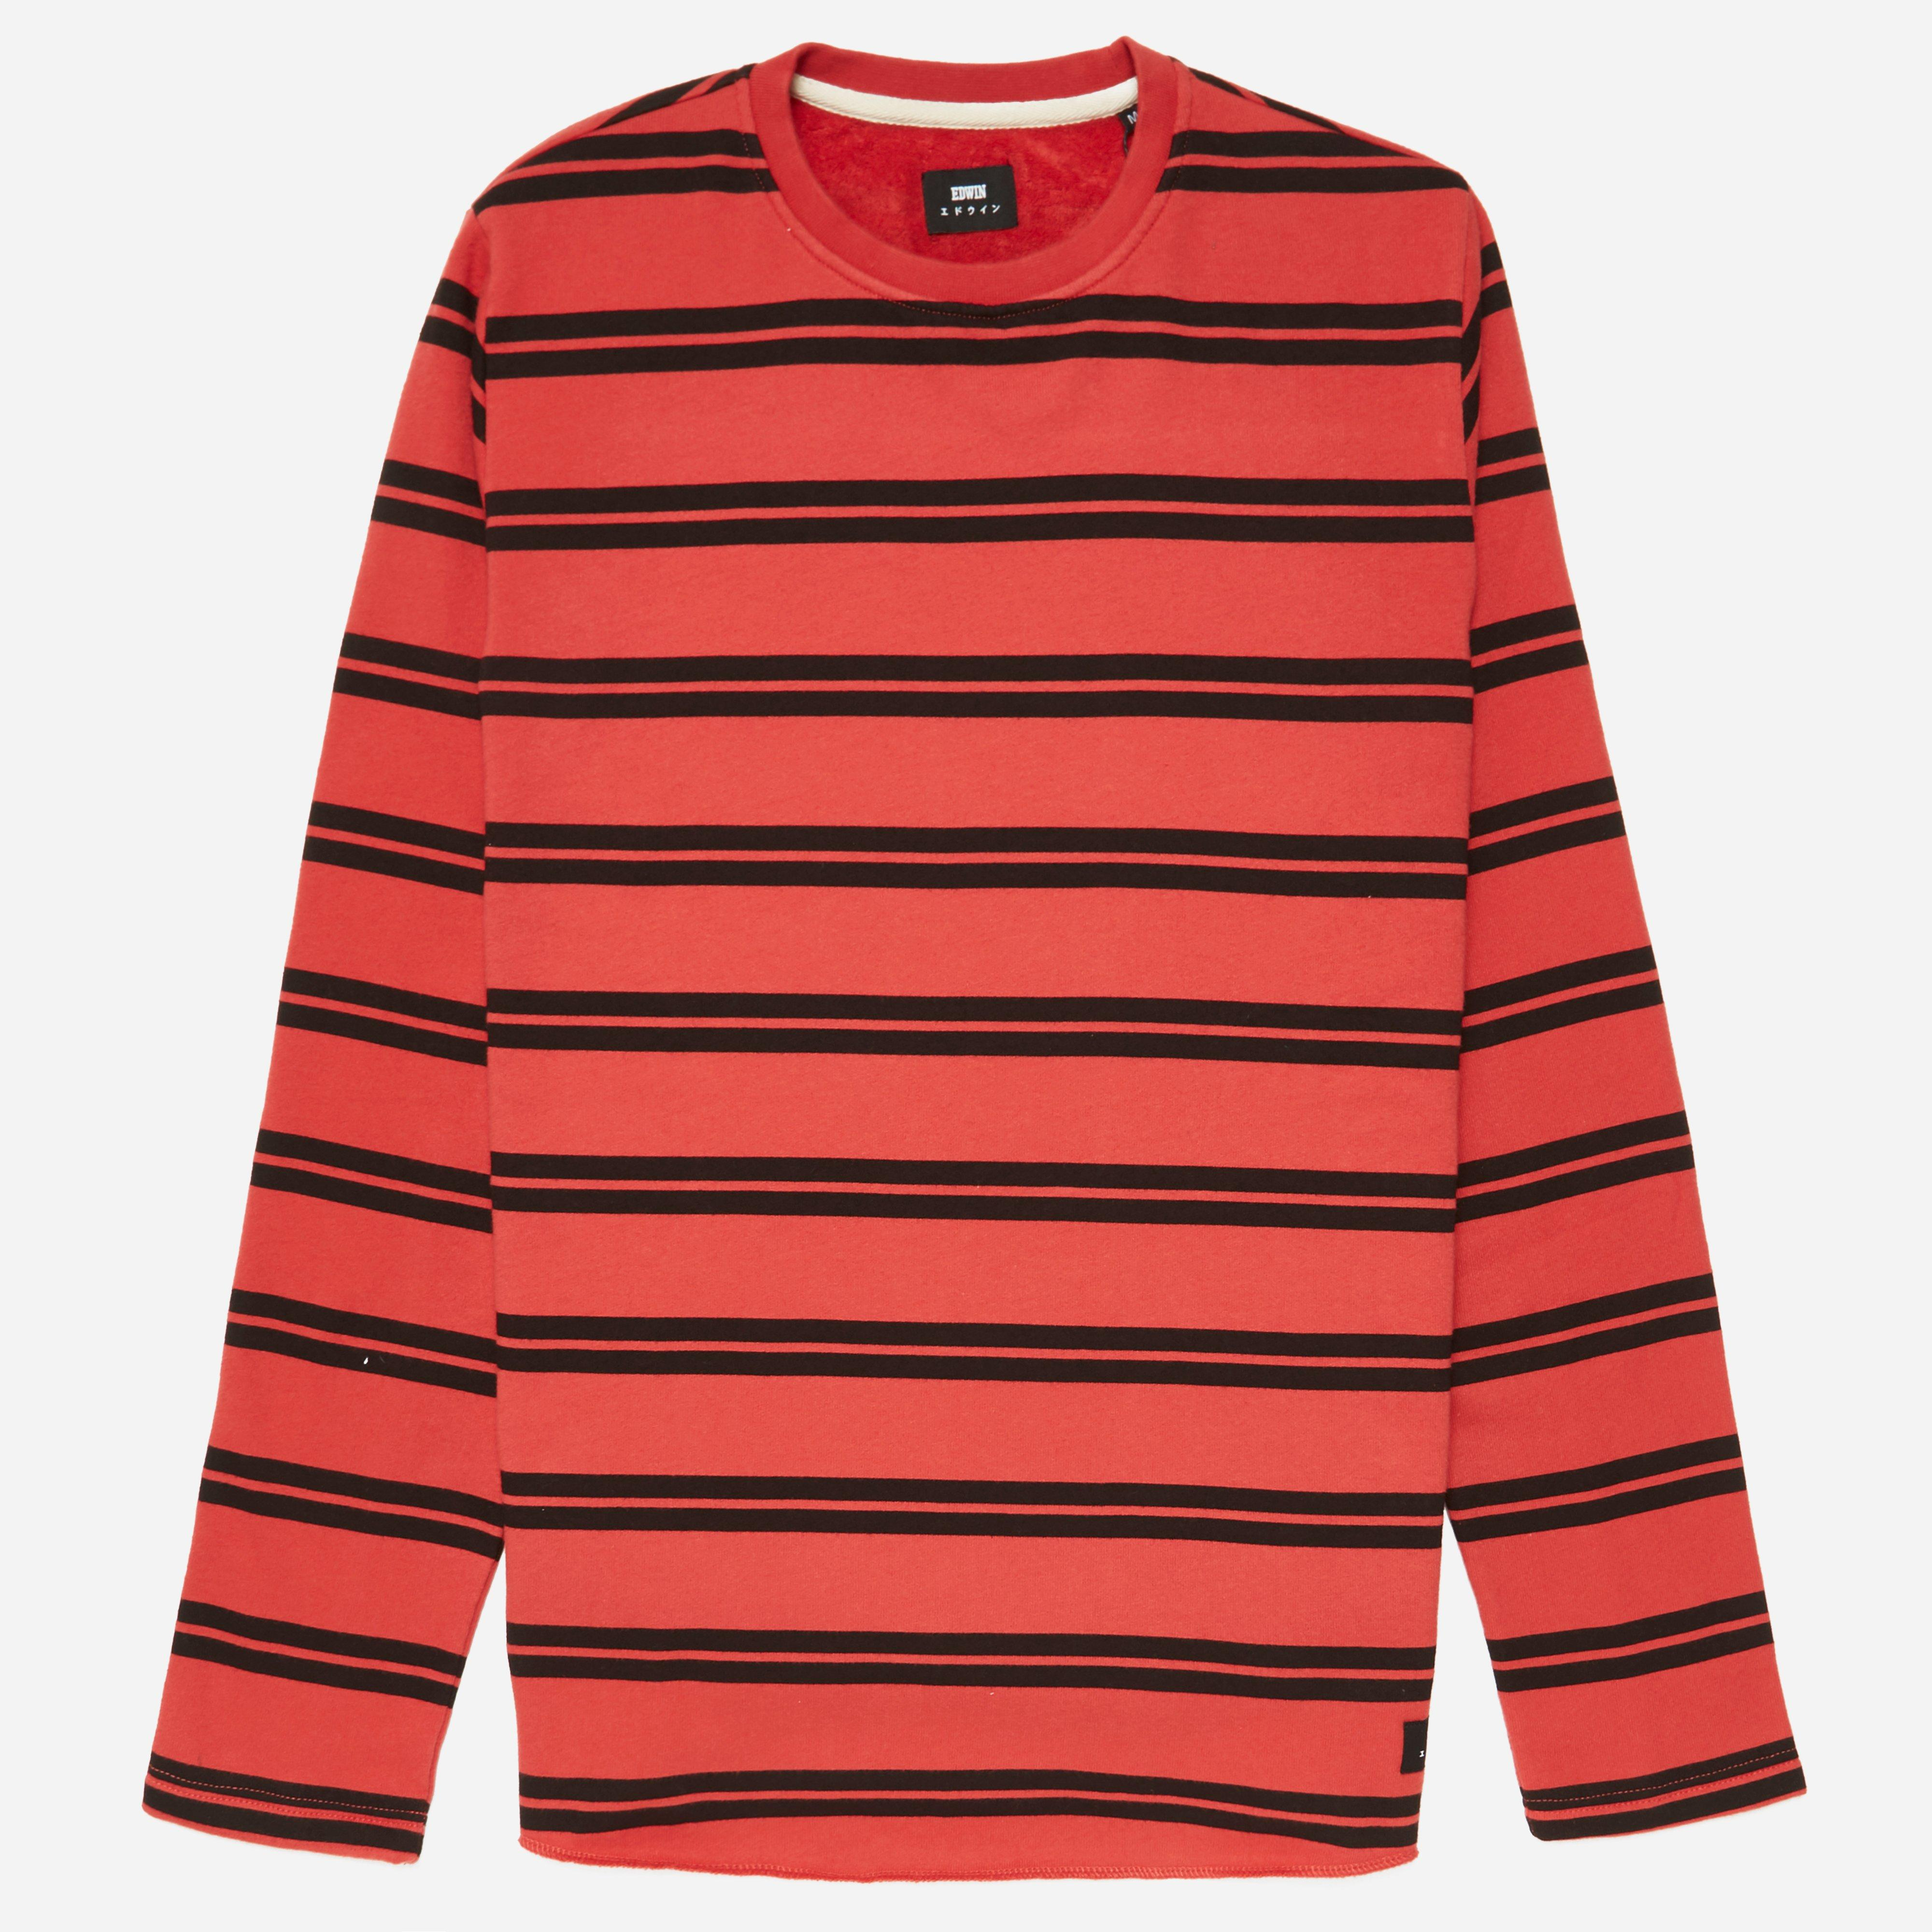 Edwin Terry Striped Crew Sweatshirt